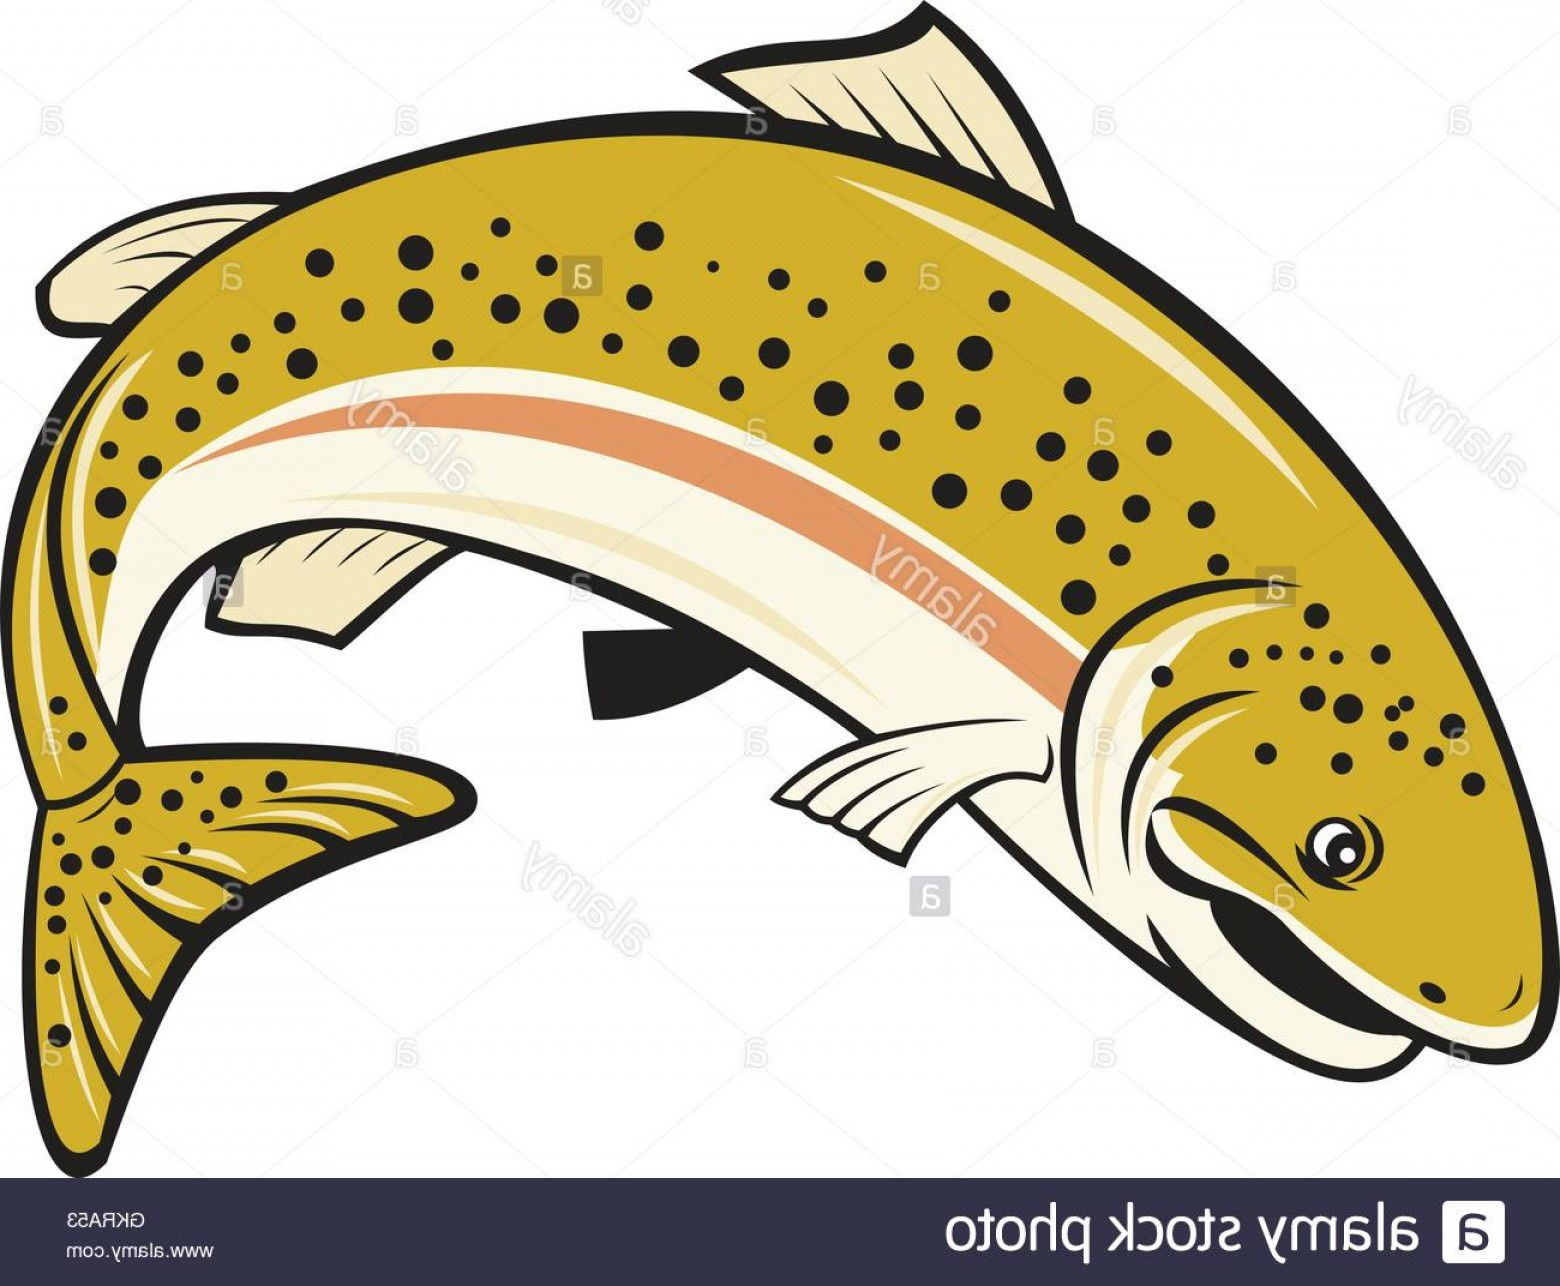 1560x1286 Stock Photo Rainbow Trout Jumping Cartoon Isolated Sohadacouri